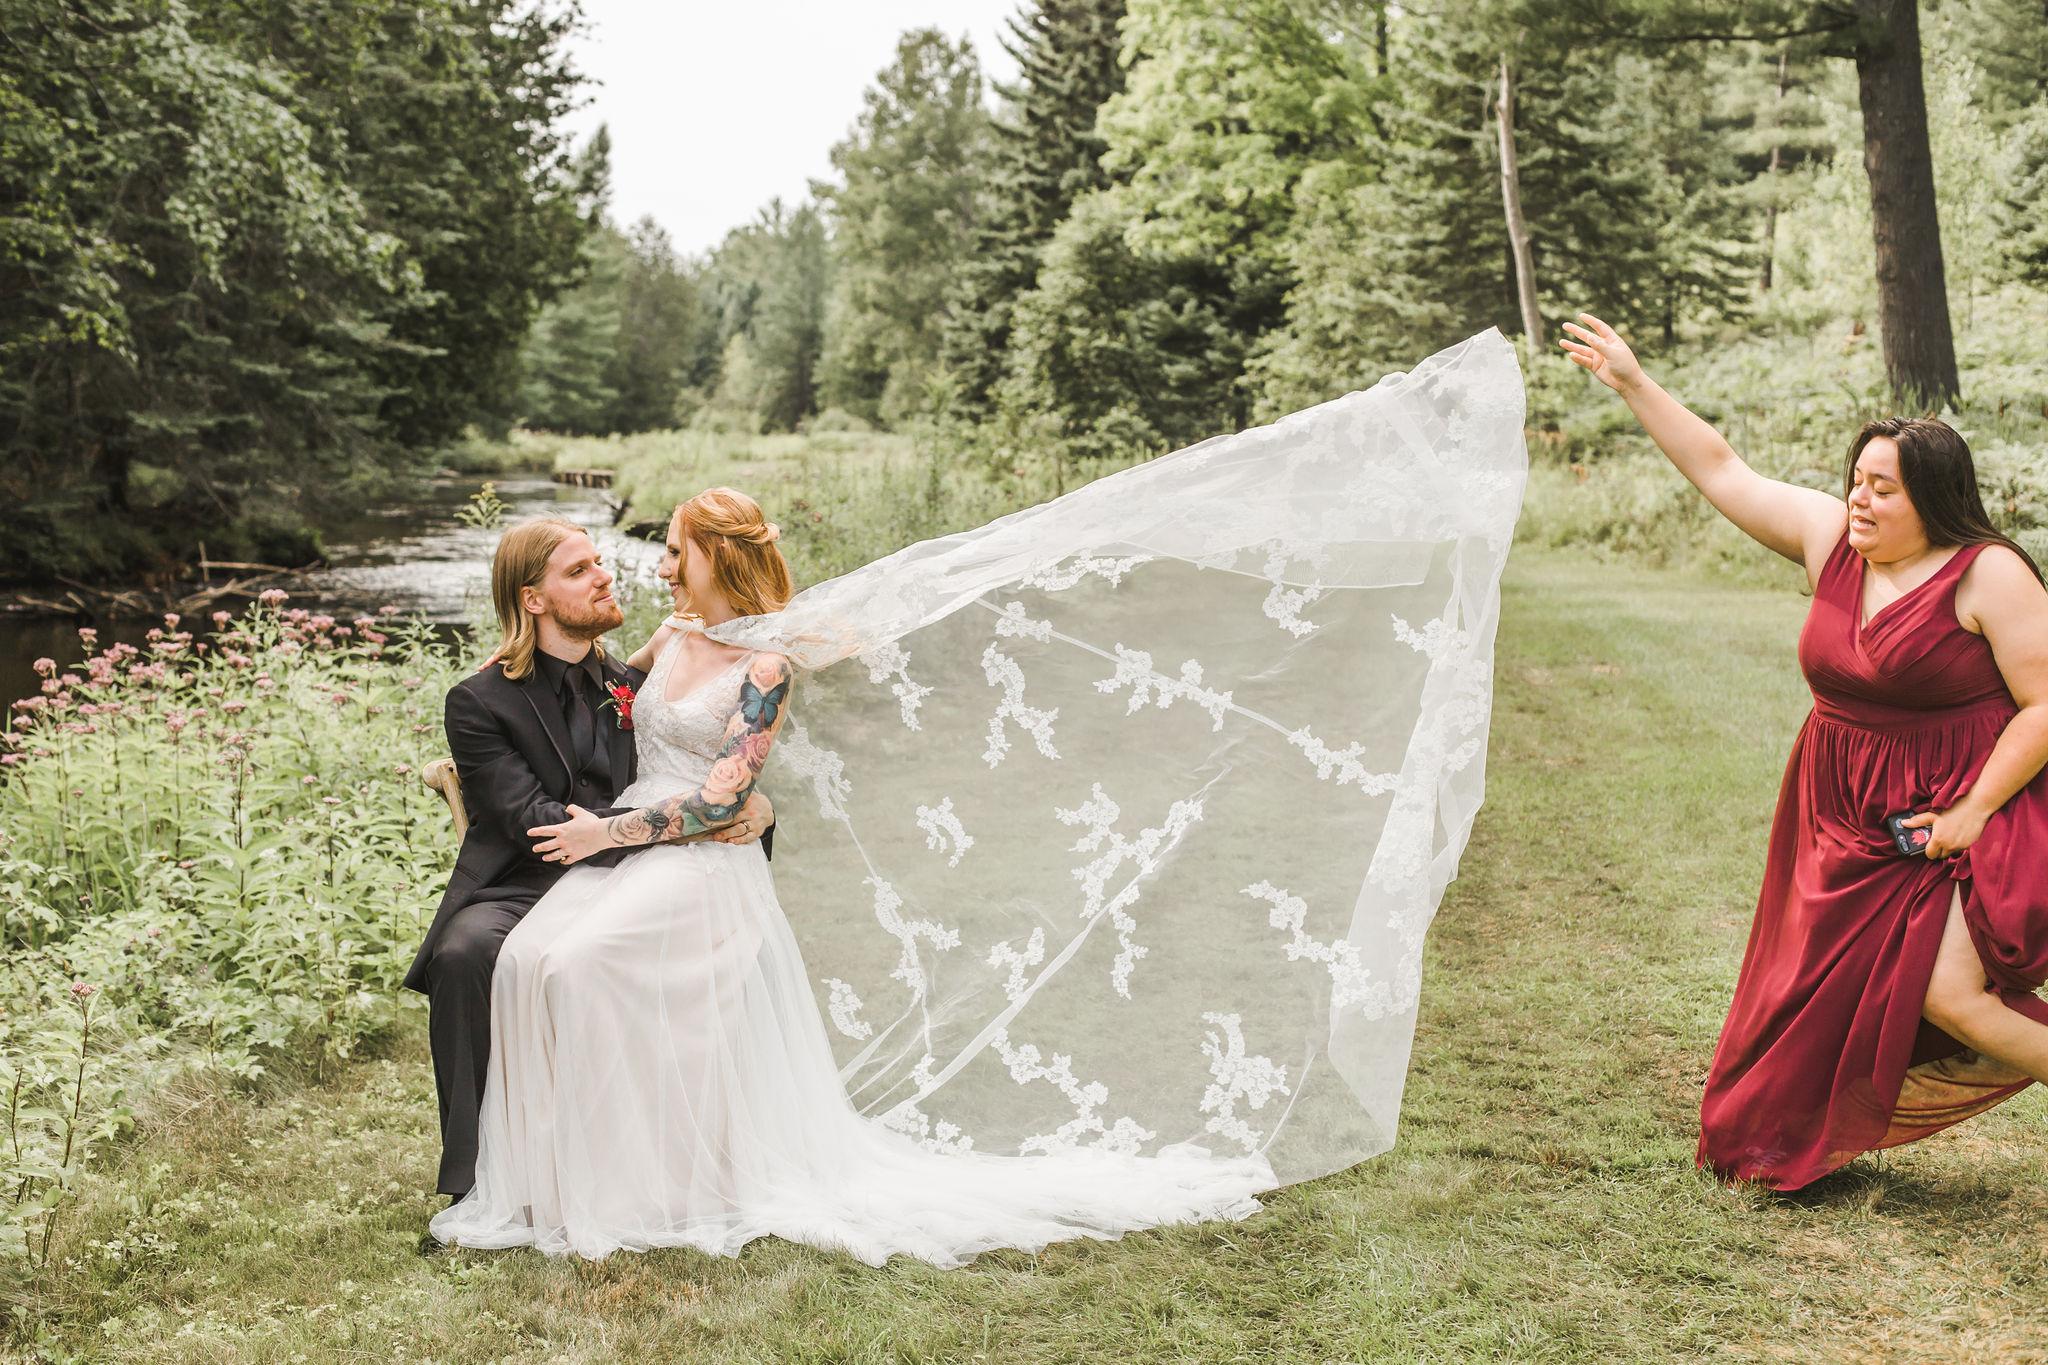 Lacey wedding cape dress